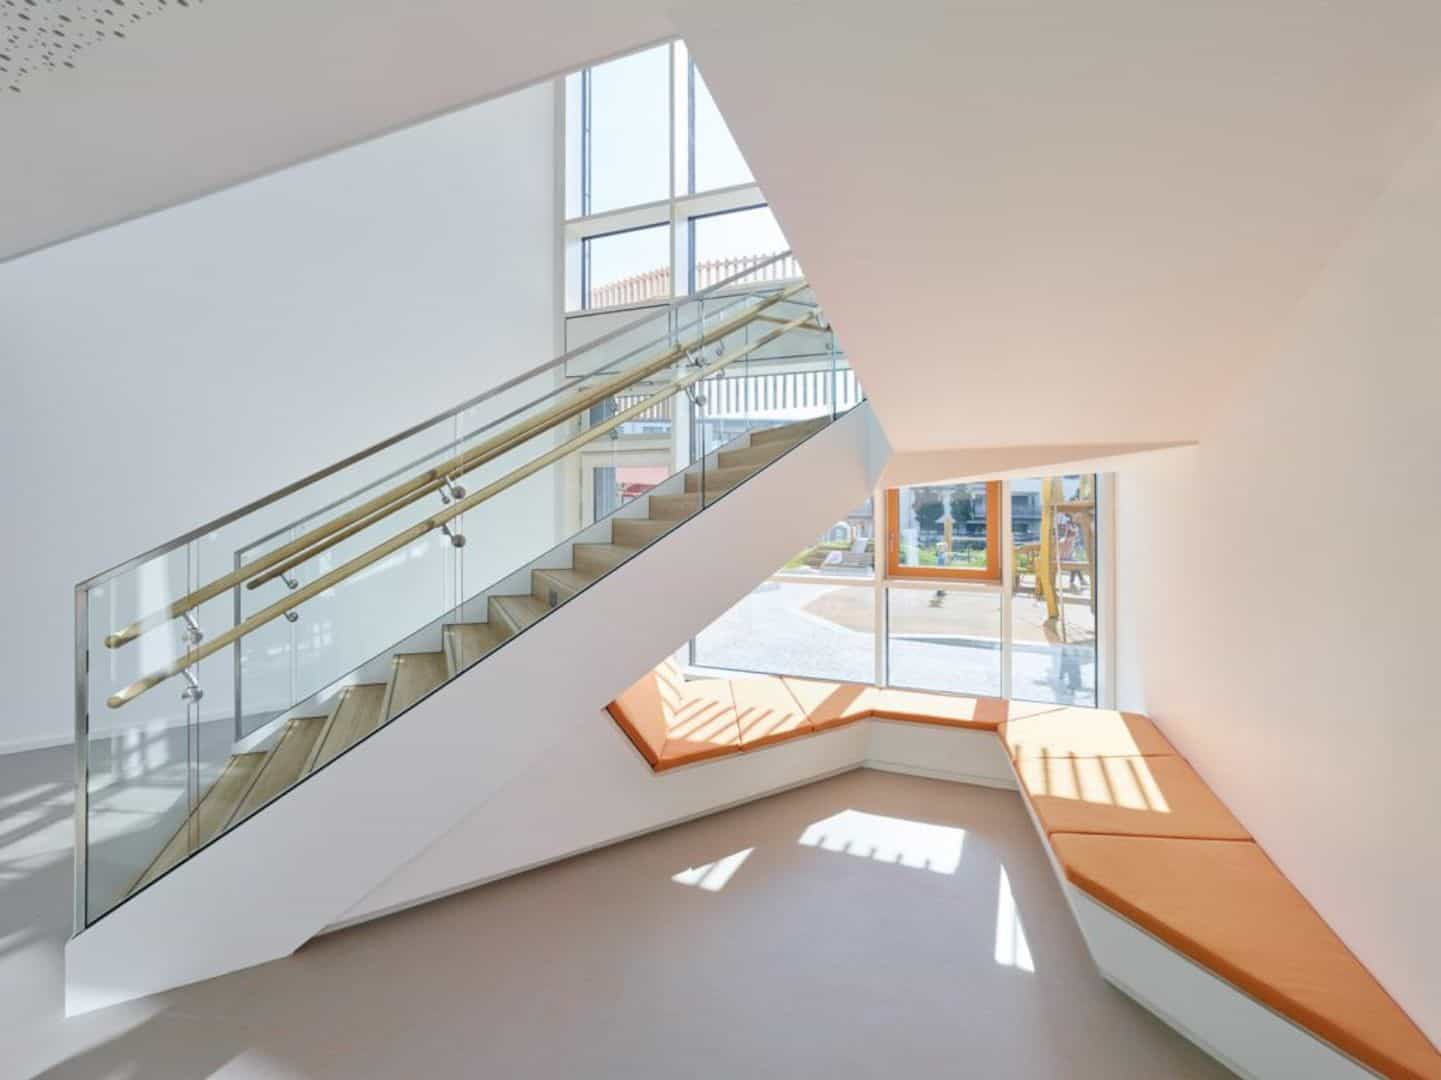 Koenigsblick Kindergarten A Childcare Center Incorporating Park Concept 1